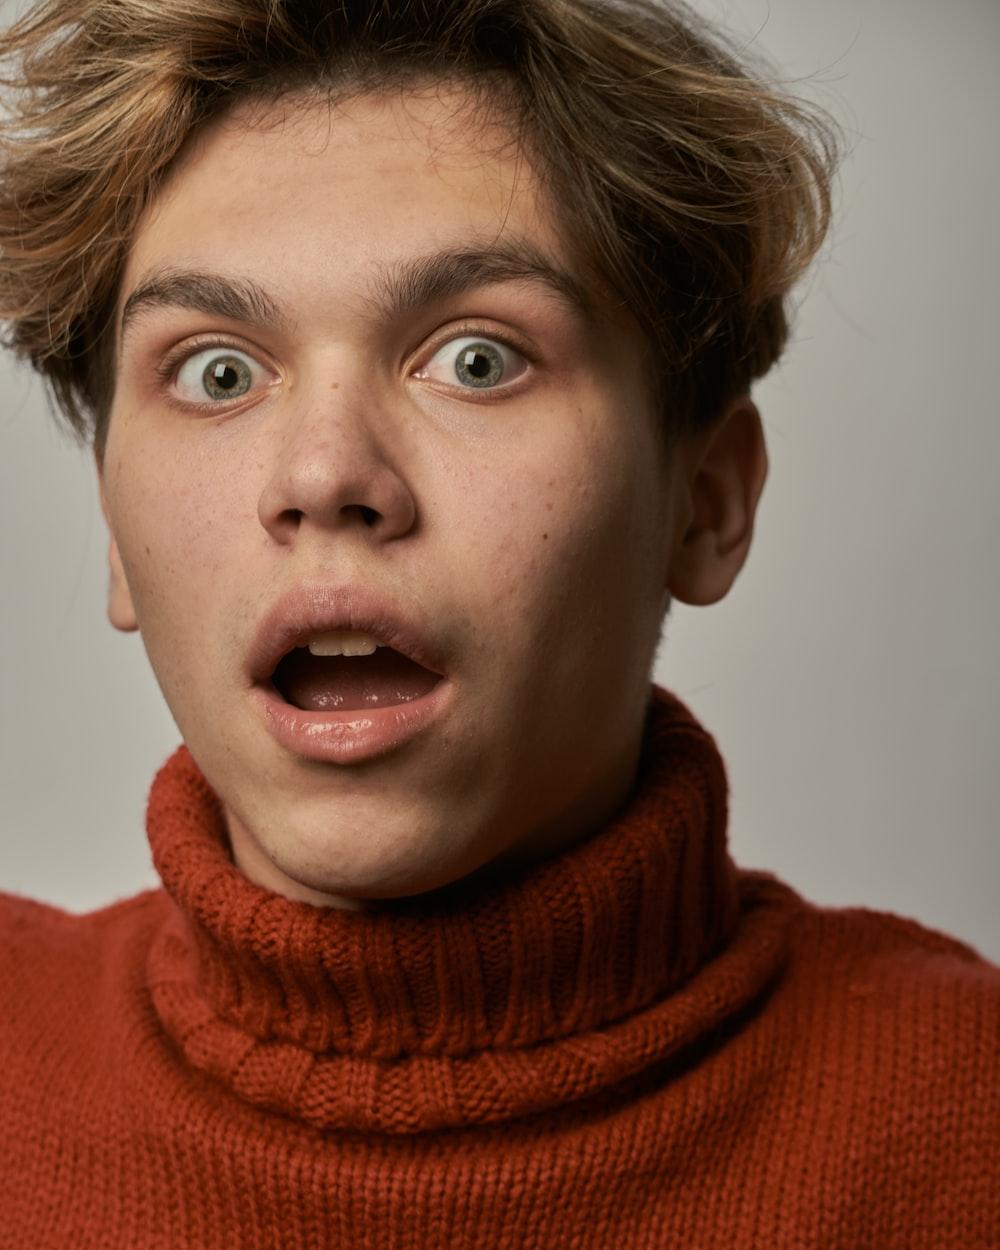 boy in red turtleneck sweater